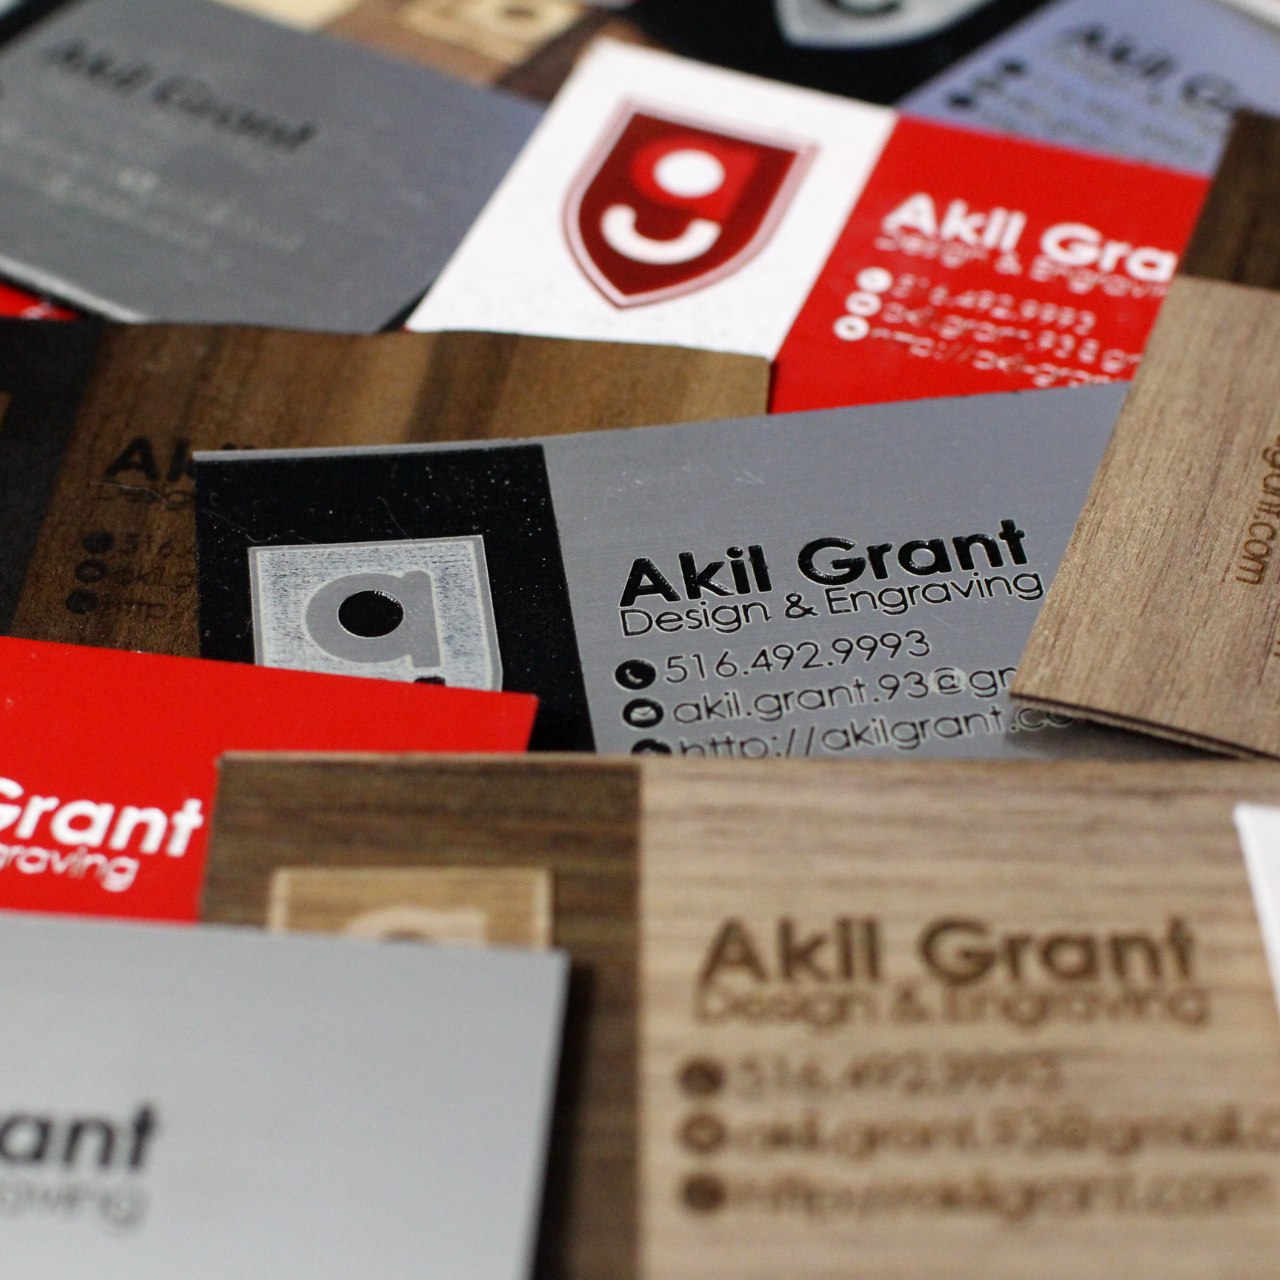 Akil Grant's Branding